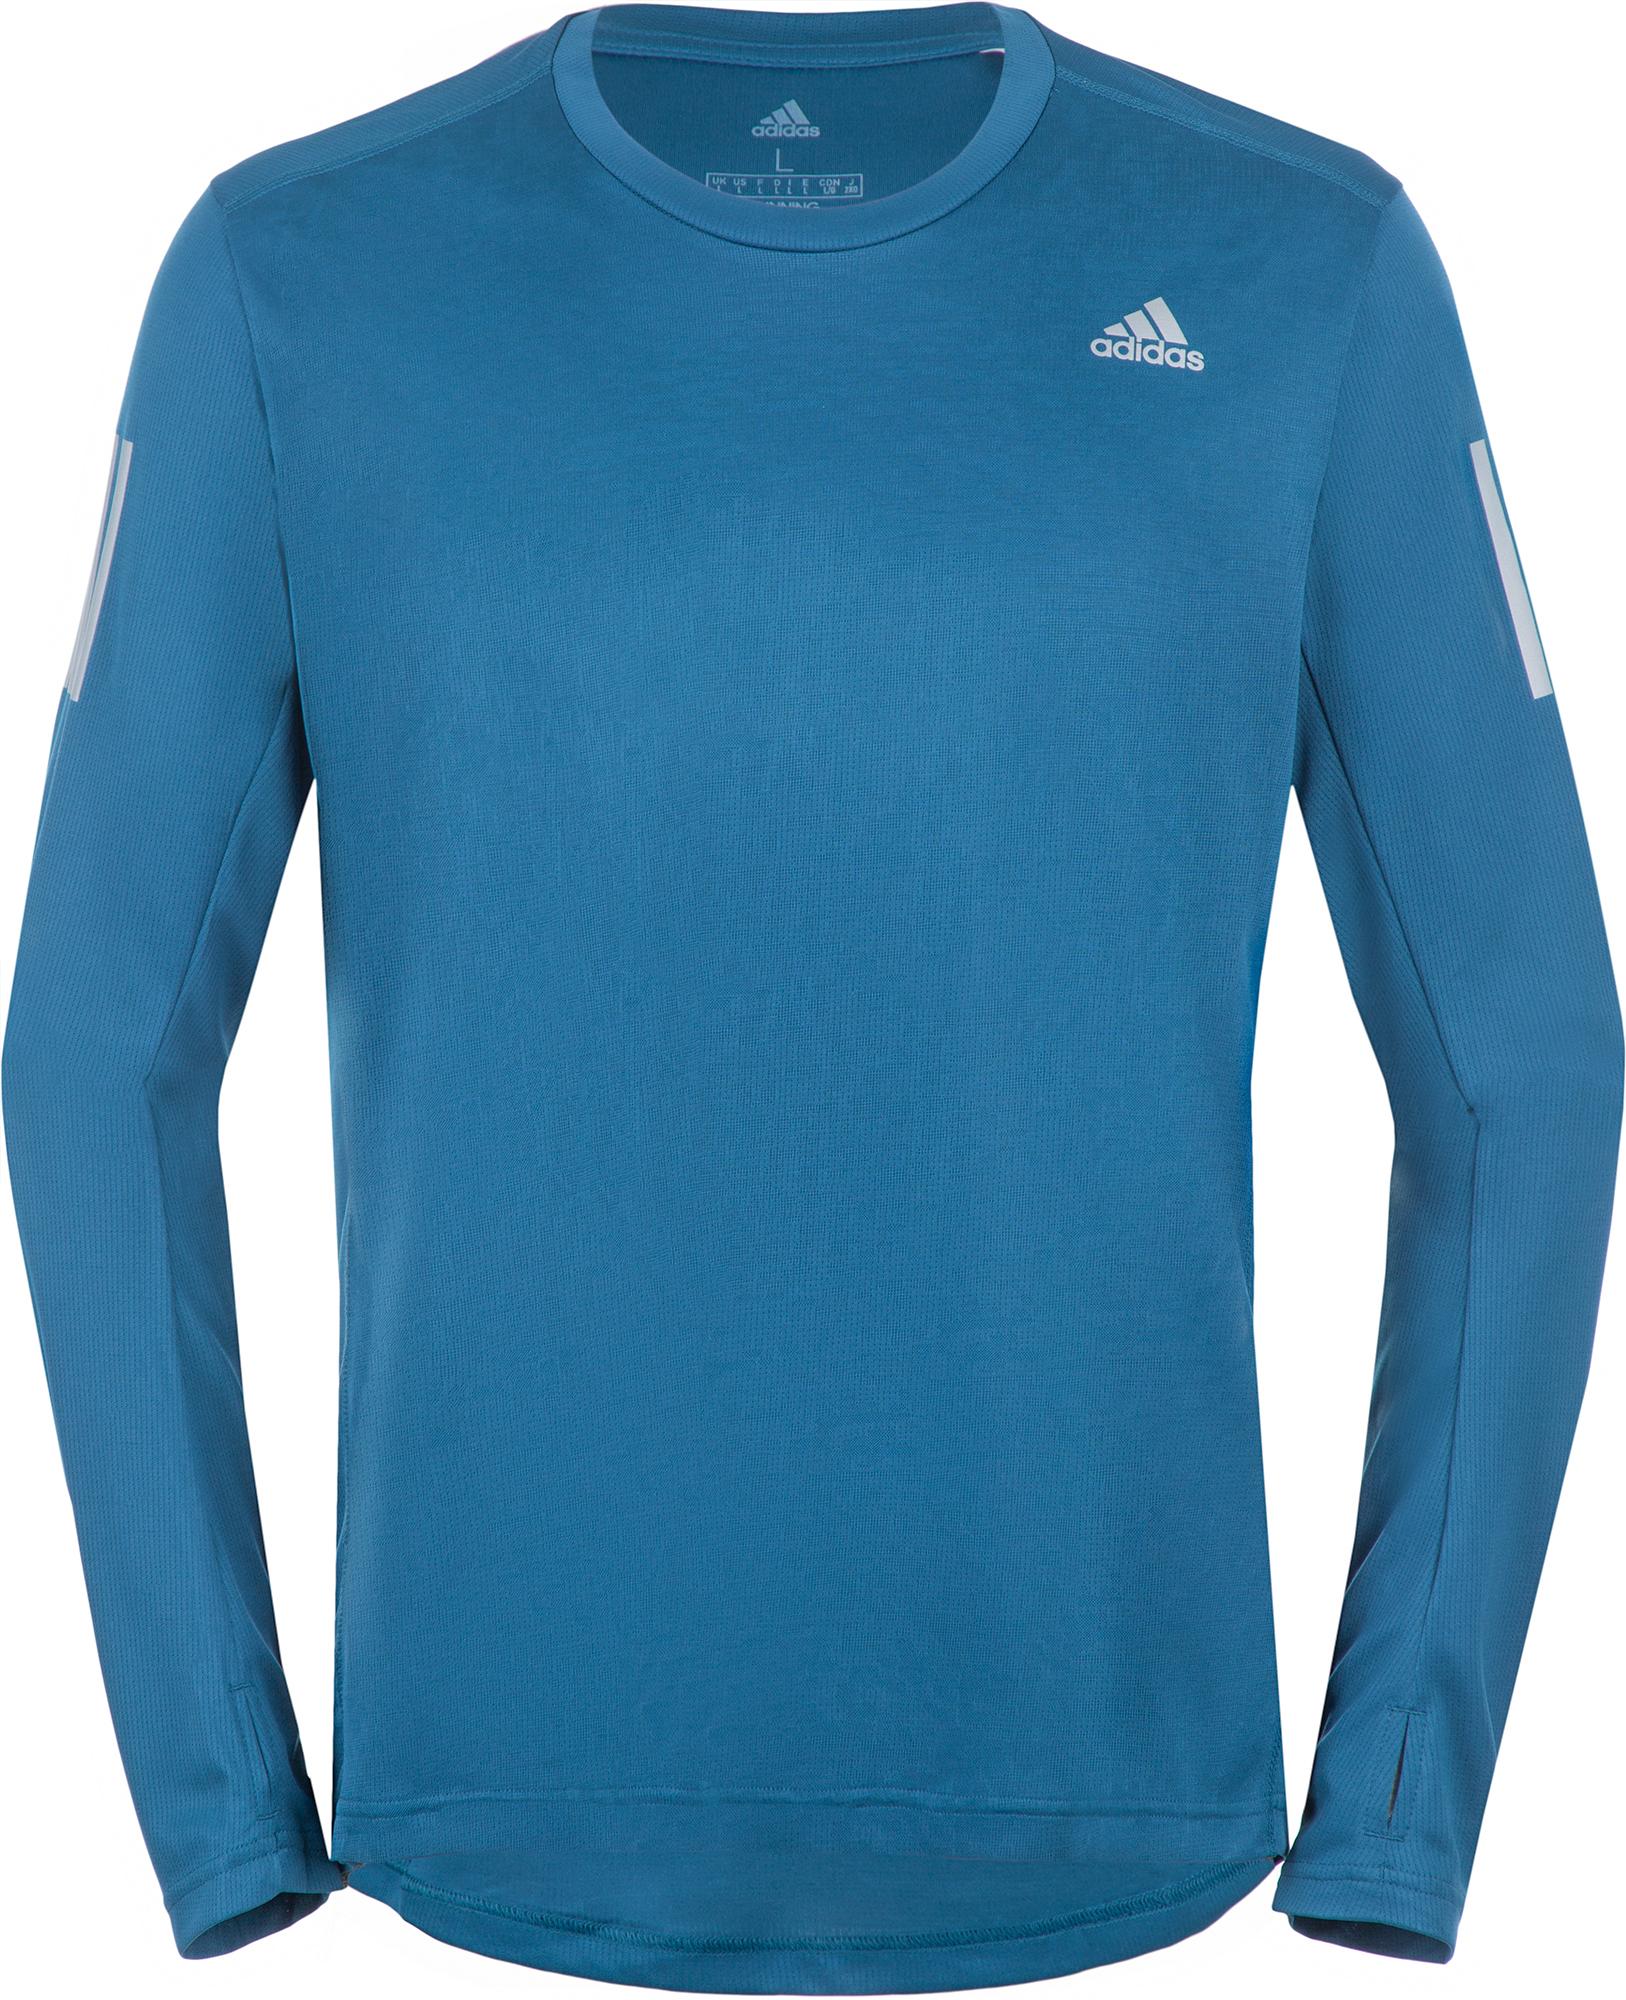 Adidas Лонгслив мужской Adidas Own The Run, размер 54 цена